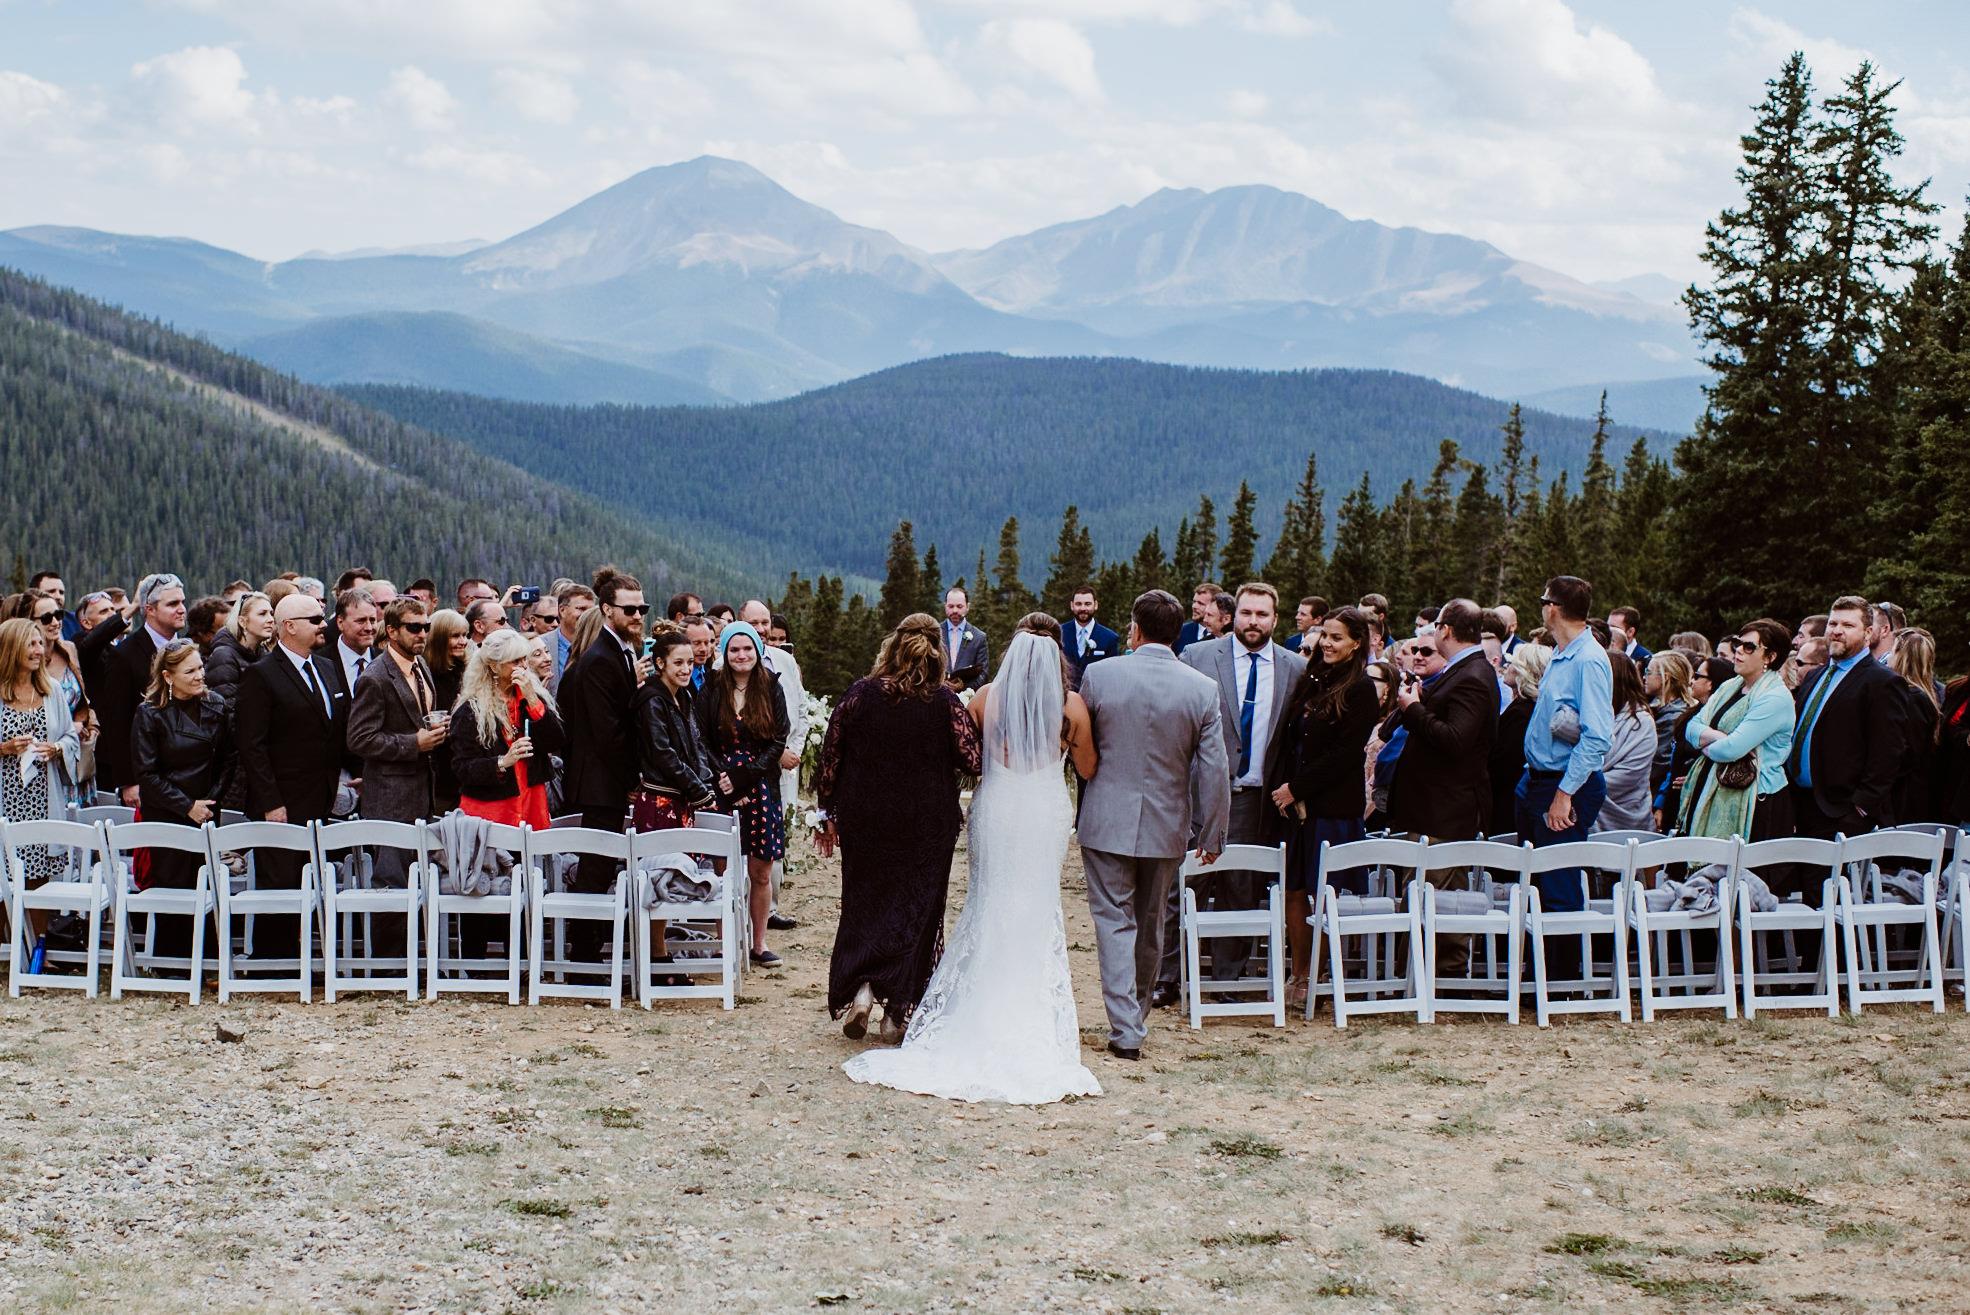 Bride and parents walking down the aisle at Keystone, Colorado mountain wedding